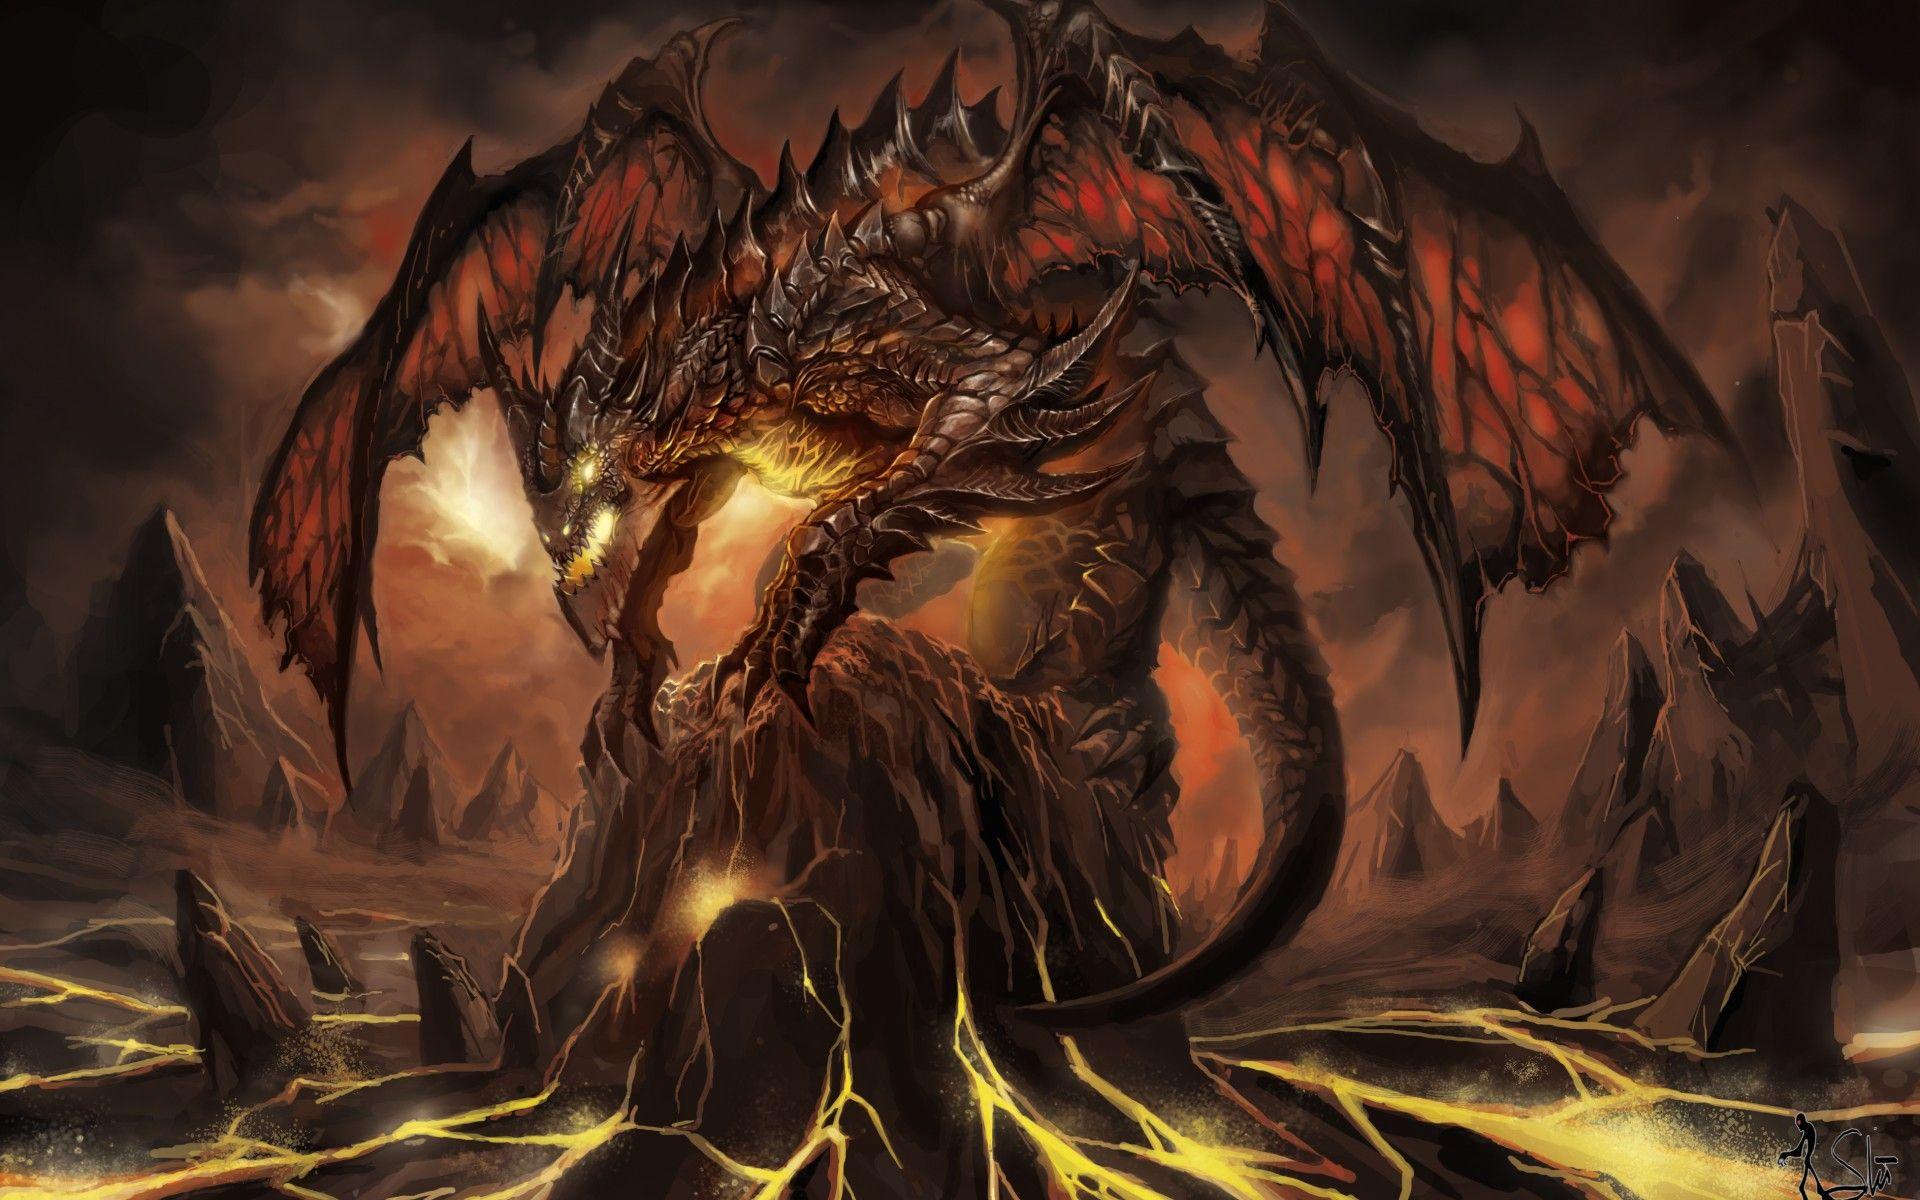 Demon Dragon Wide Desktop Background Wallpapers Hd Free 577149 Fire Dragon Fantasy Dragon Dragon Pictures